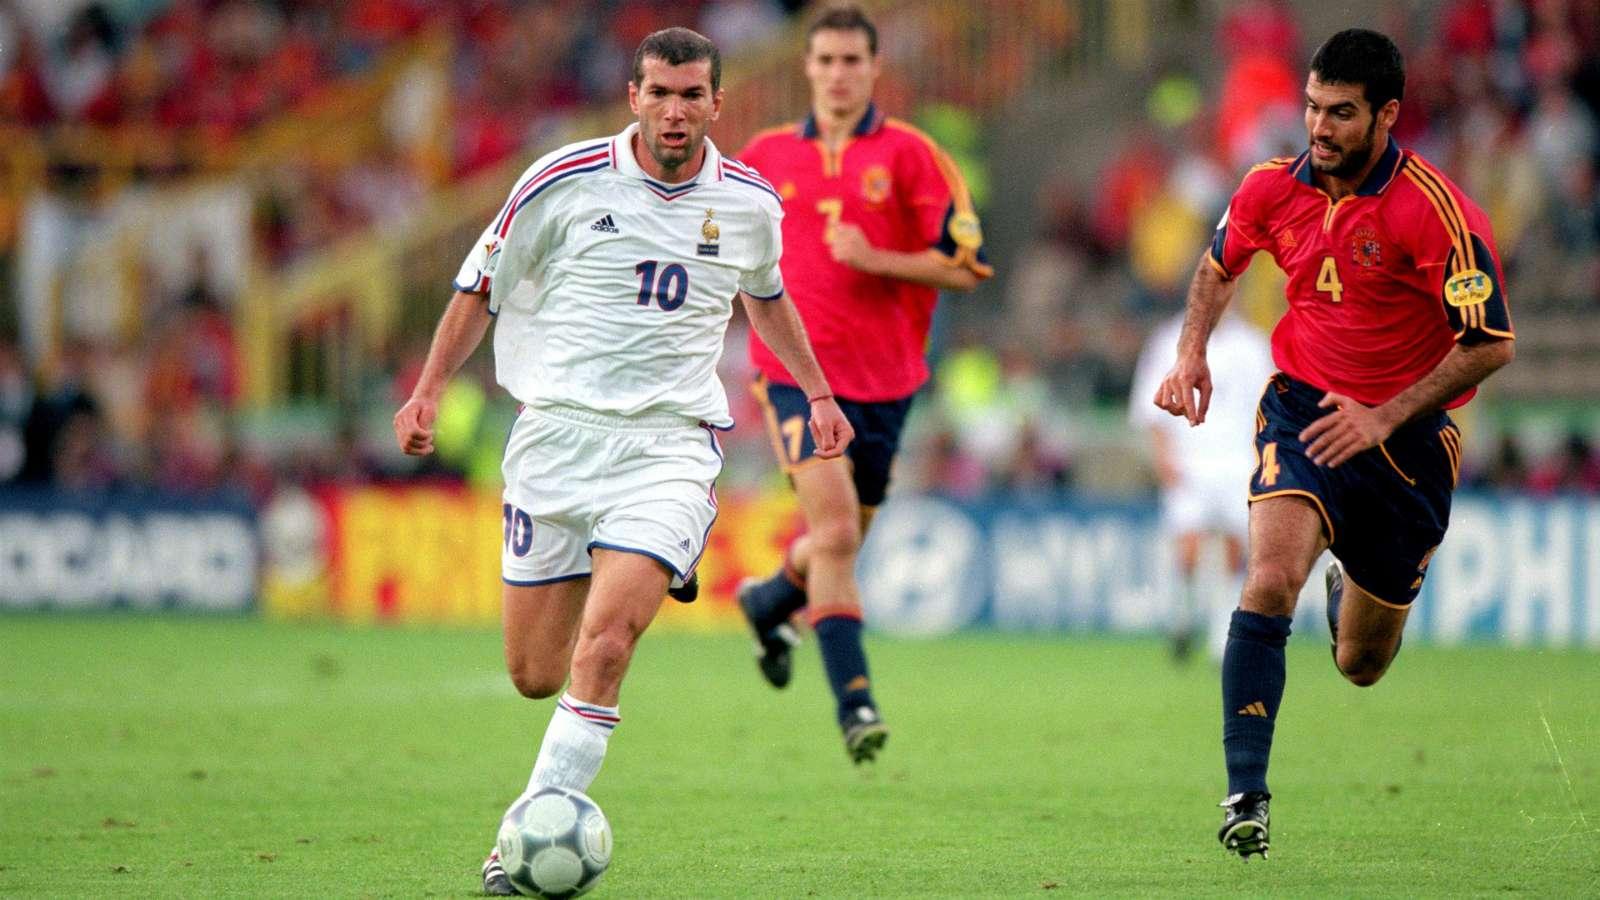 zidane-guardiola-espana-francia-spain-euro-2000